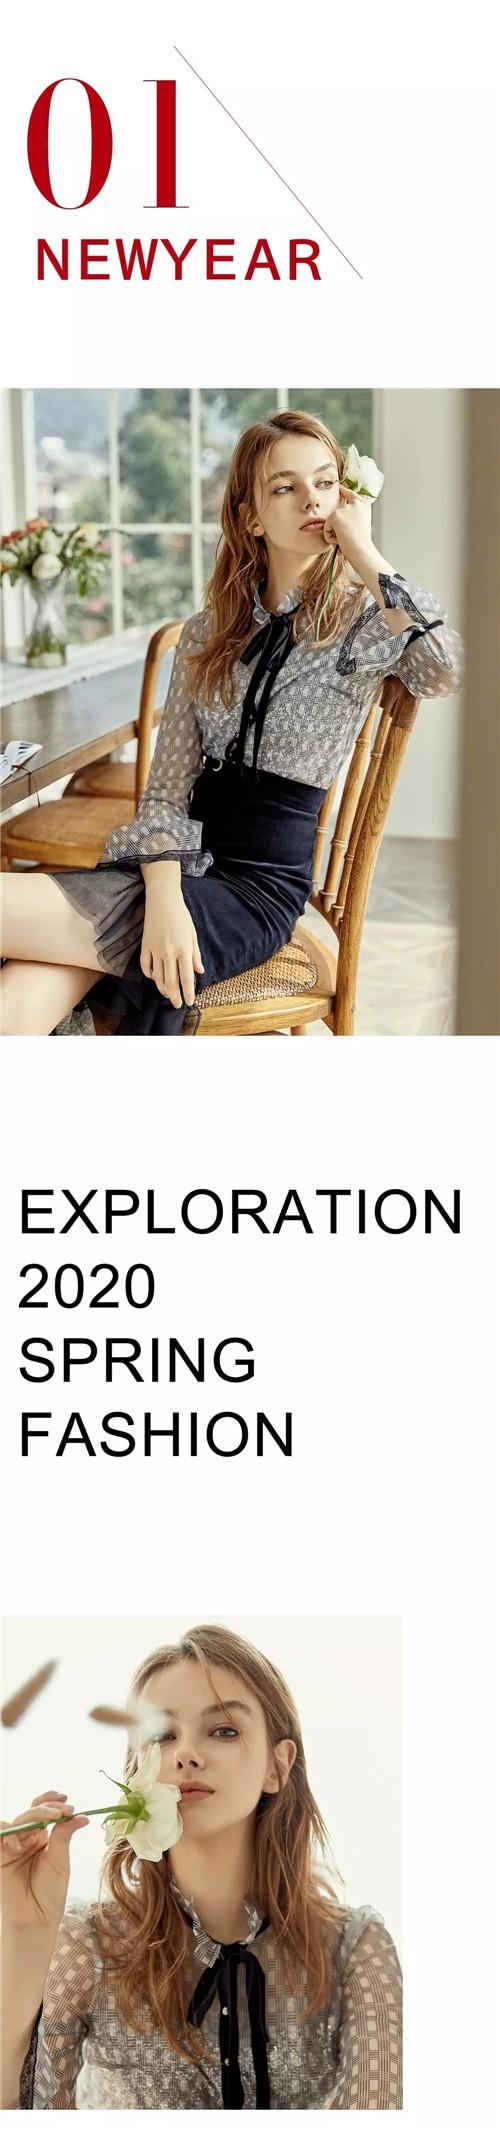 Biselena贝茜妮女装2020春季新品系列:璀璨耀眼